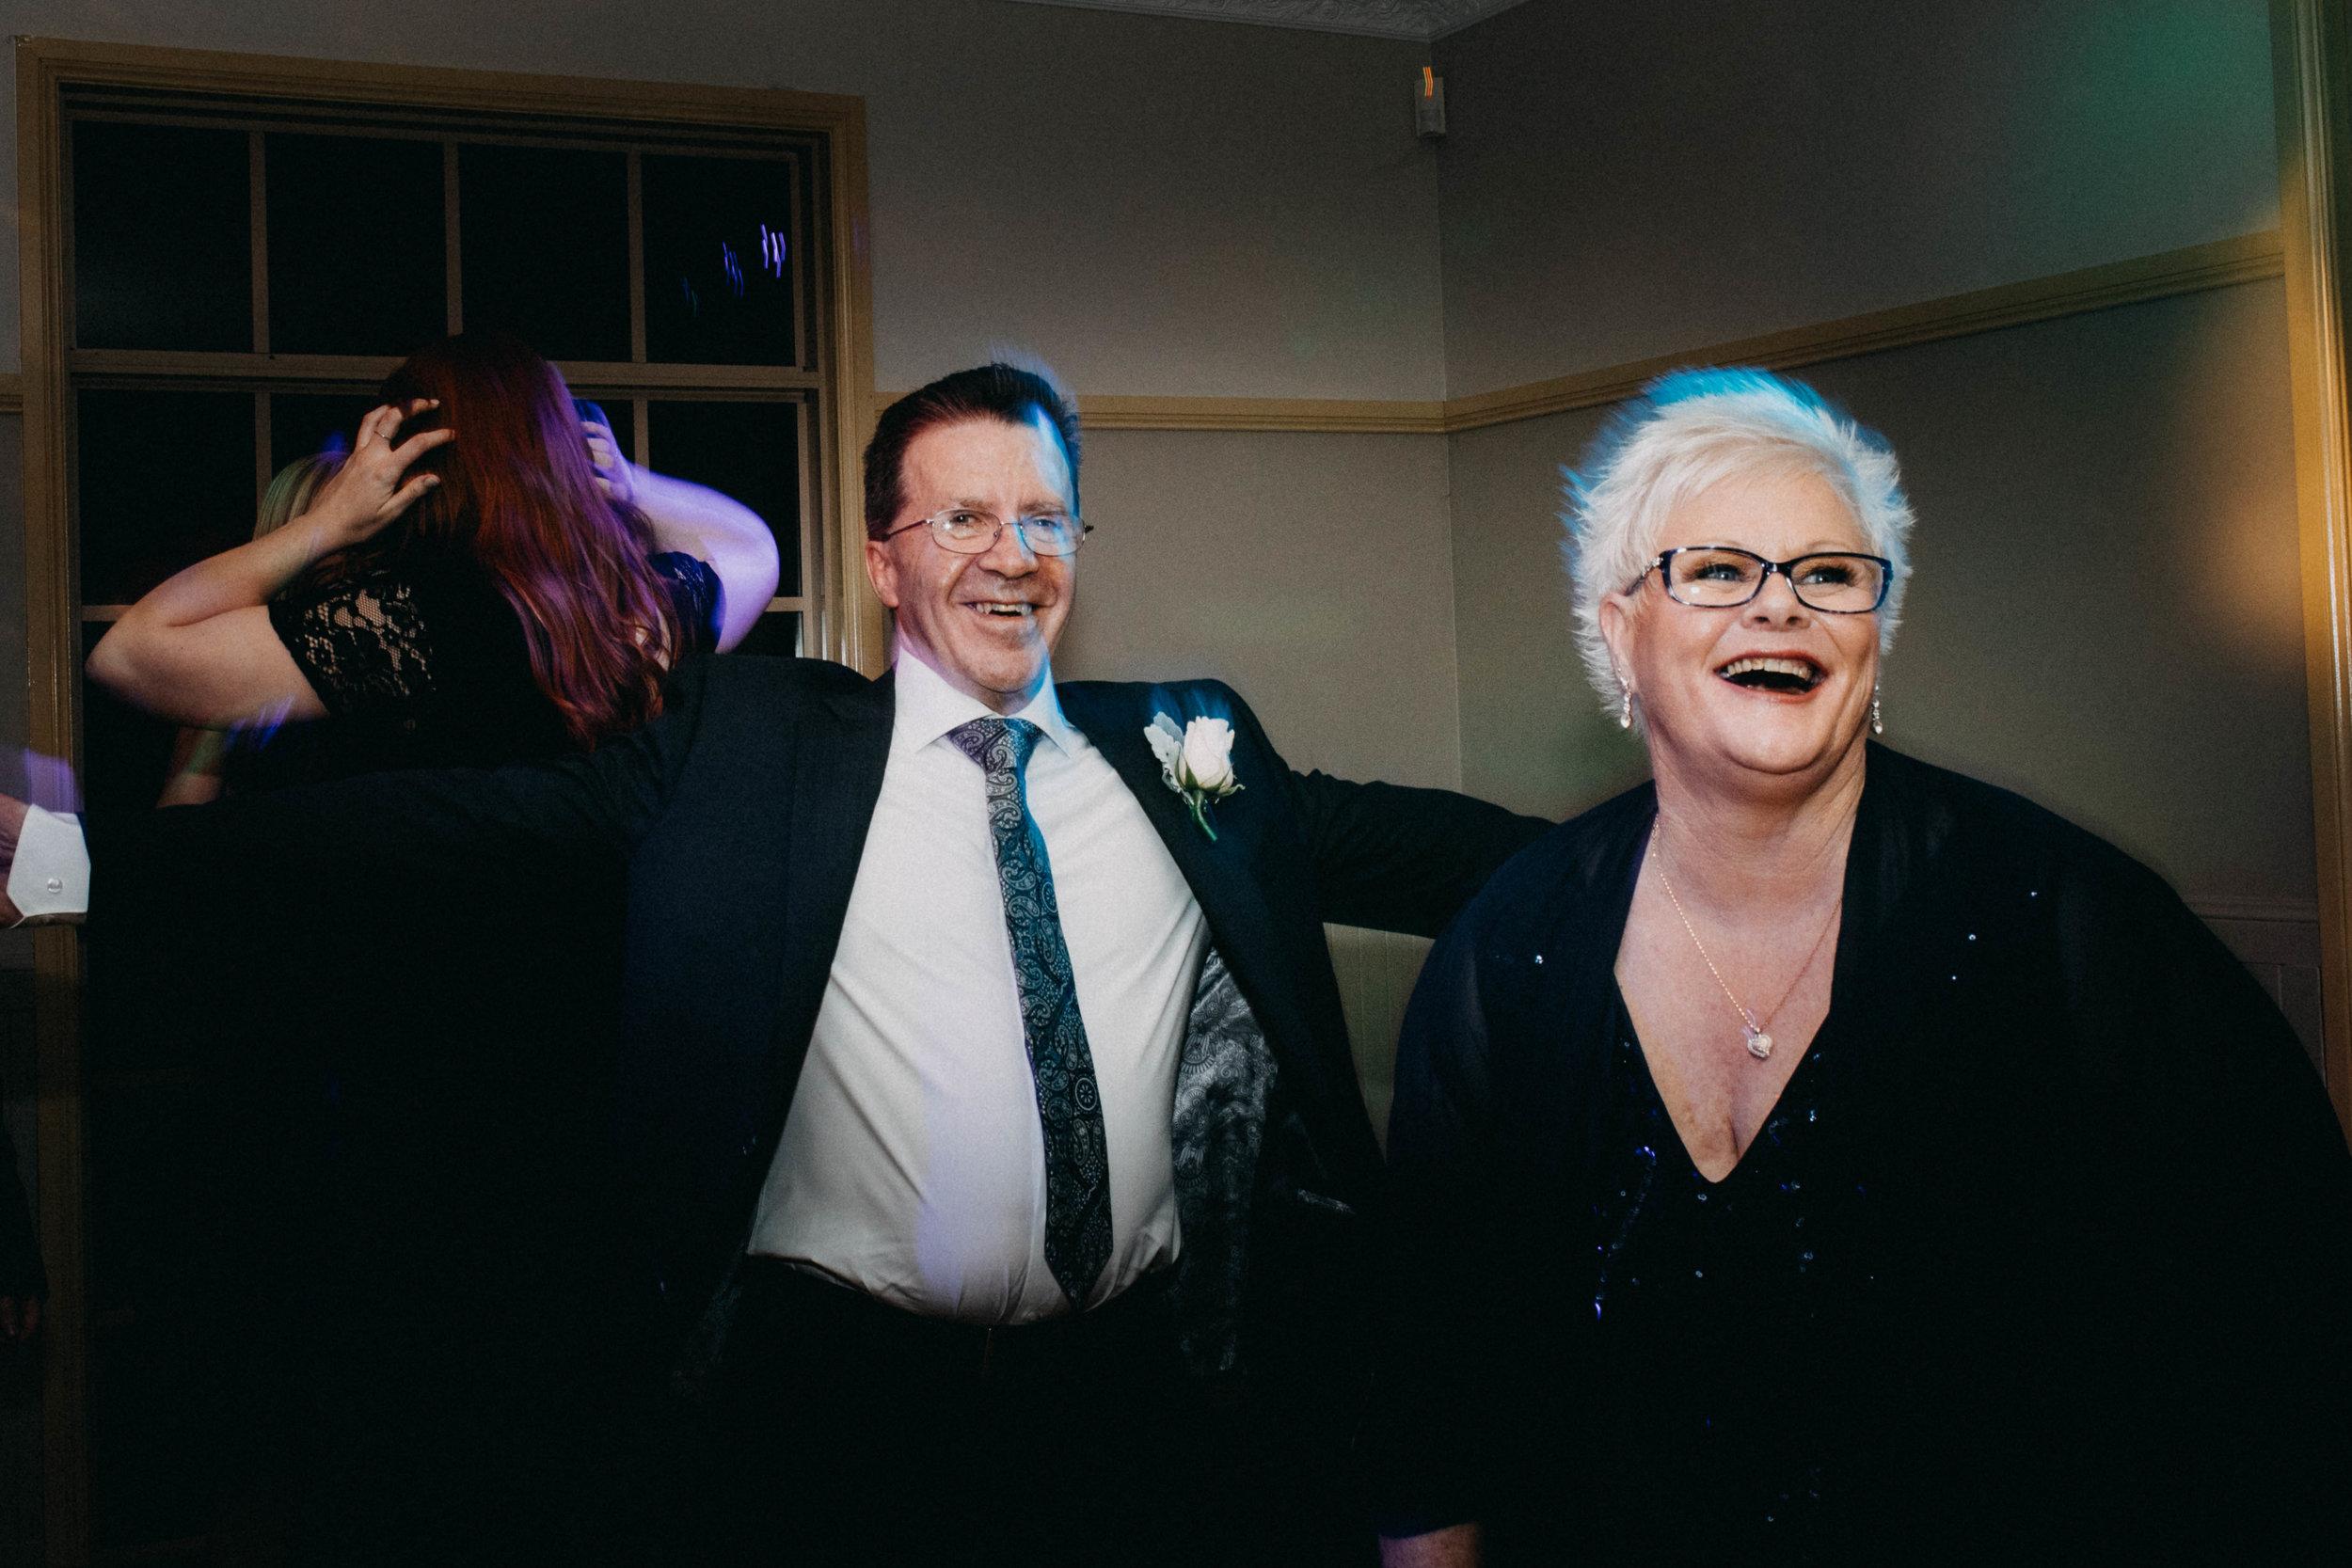 appin-house-wedding-macarthur-www.emilyobrienphotography.net-192.jpg